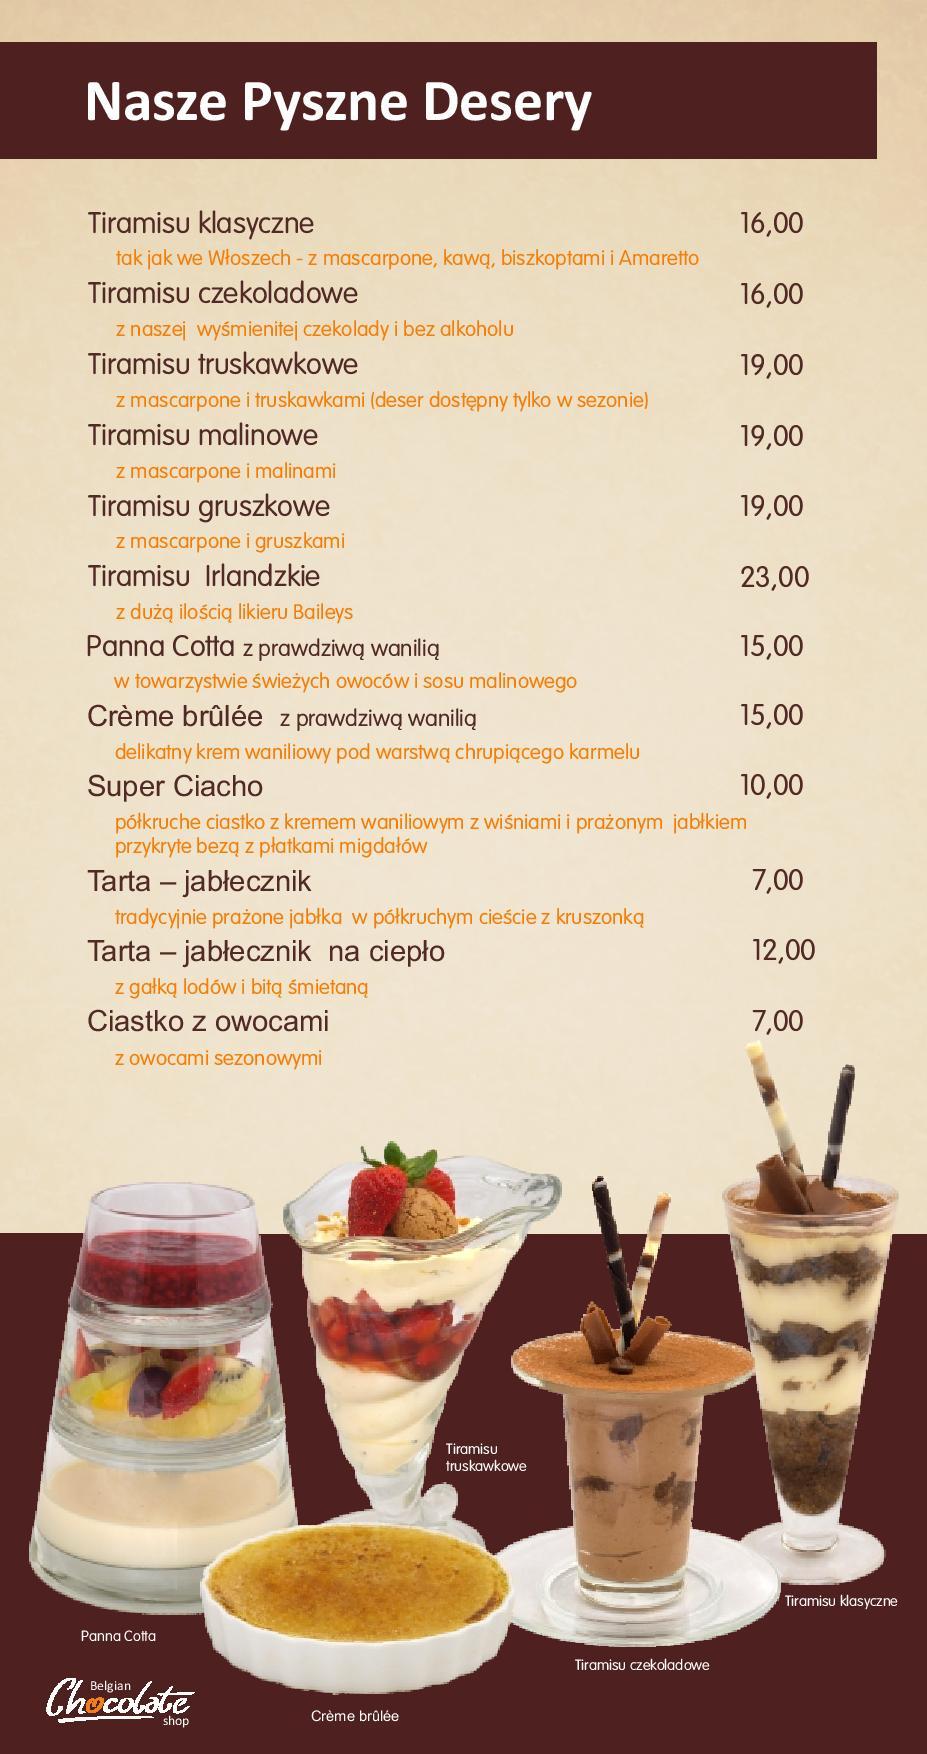 2015-03 Belgian Chocolate Shop Nowe Menu w3b-page-018